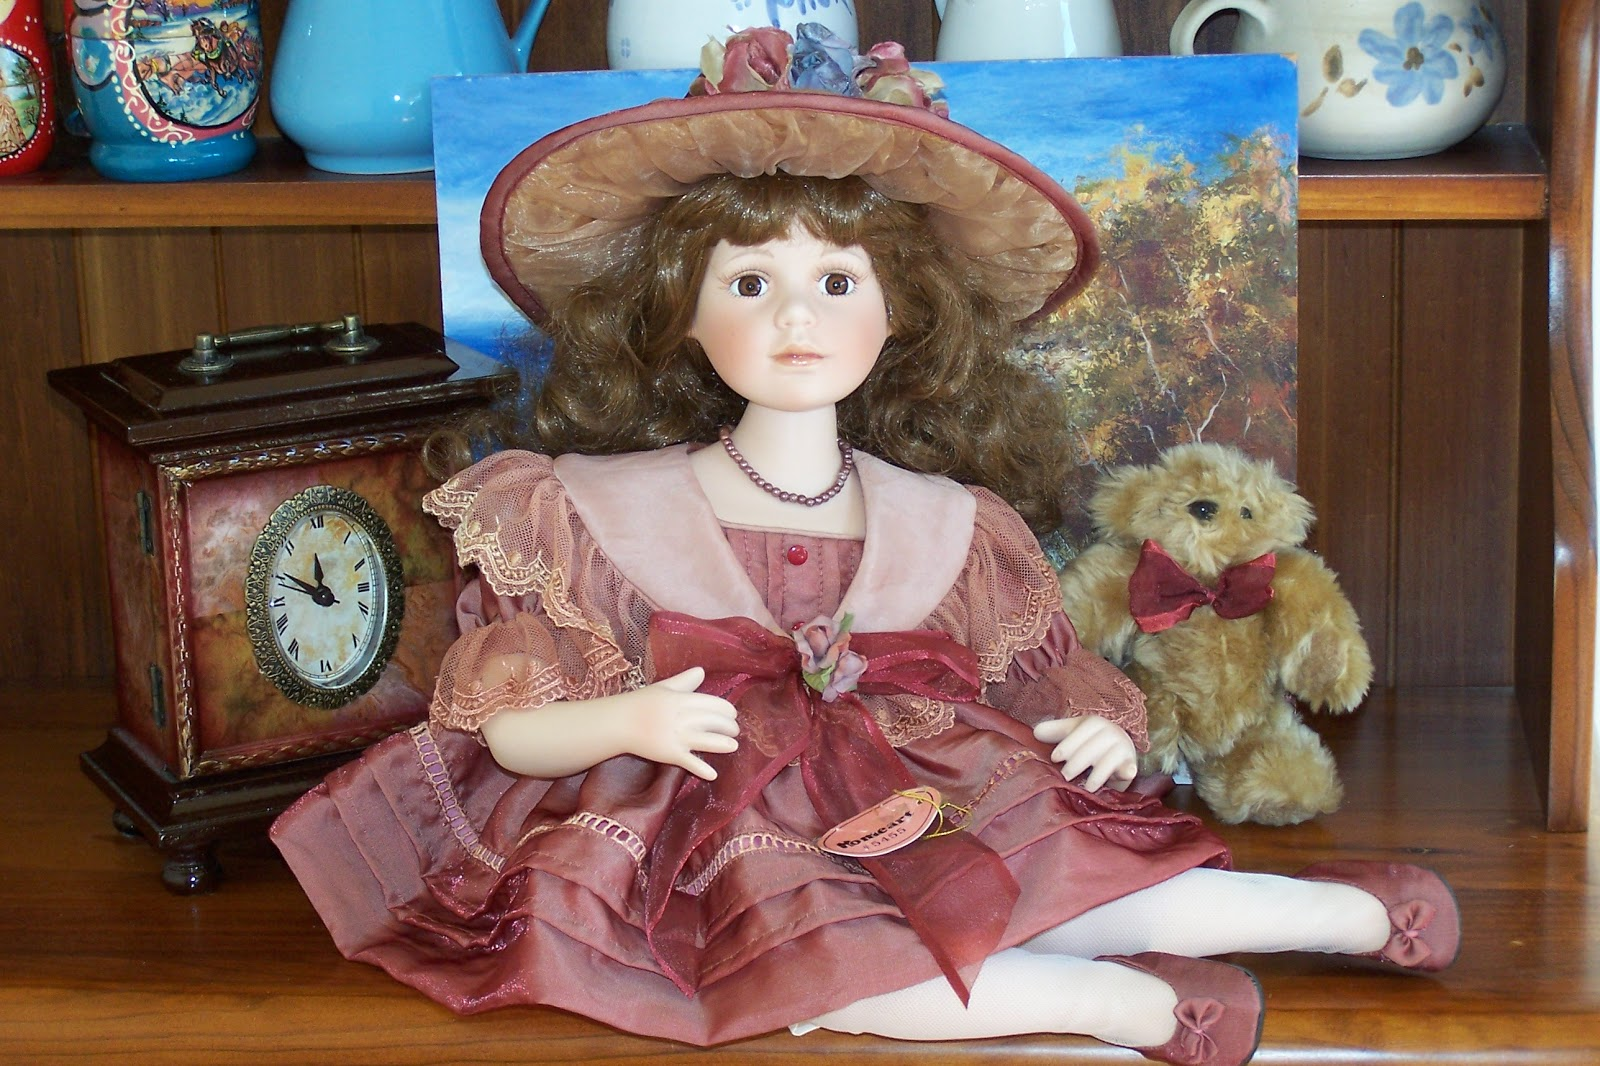 lizzie s arty crafty n dolls dolls rebecca a homeart store